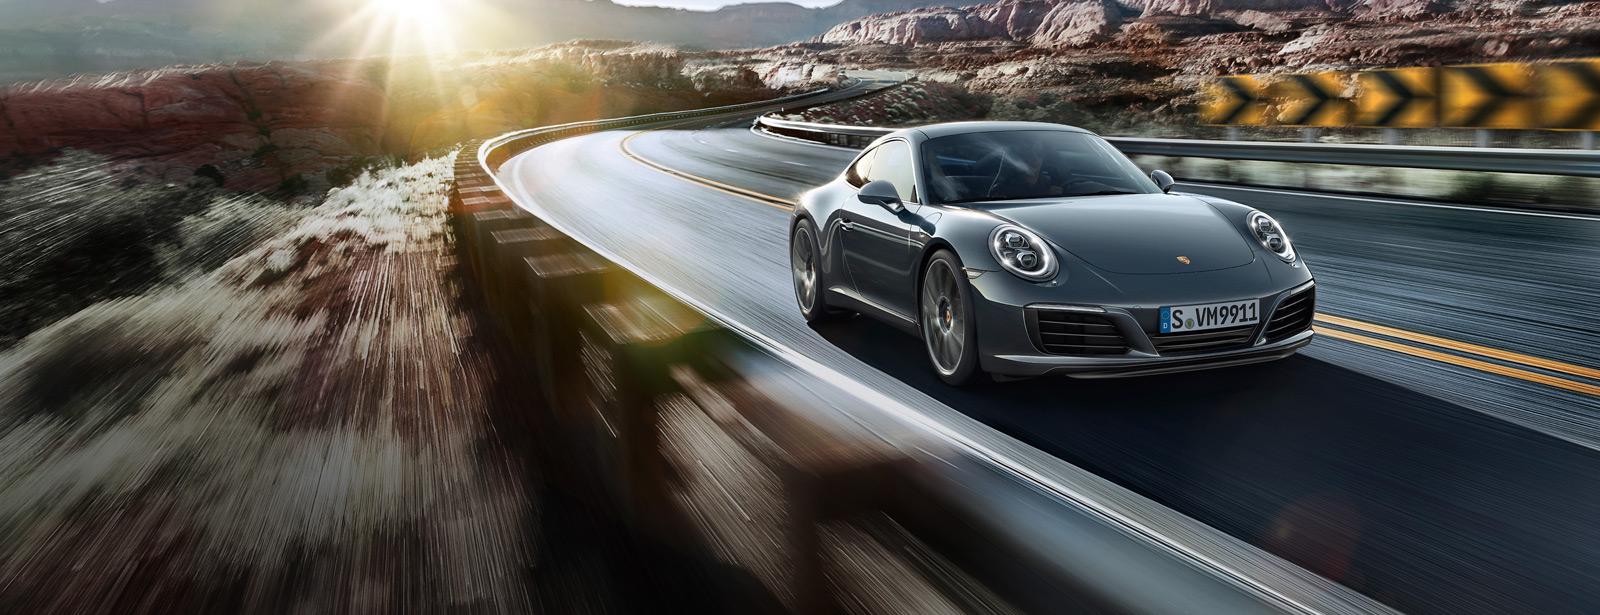 2017 Porsche 911 Carrera near Los Angeles